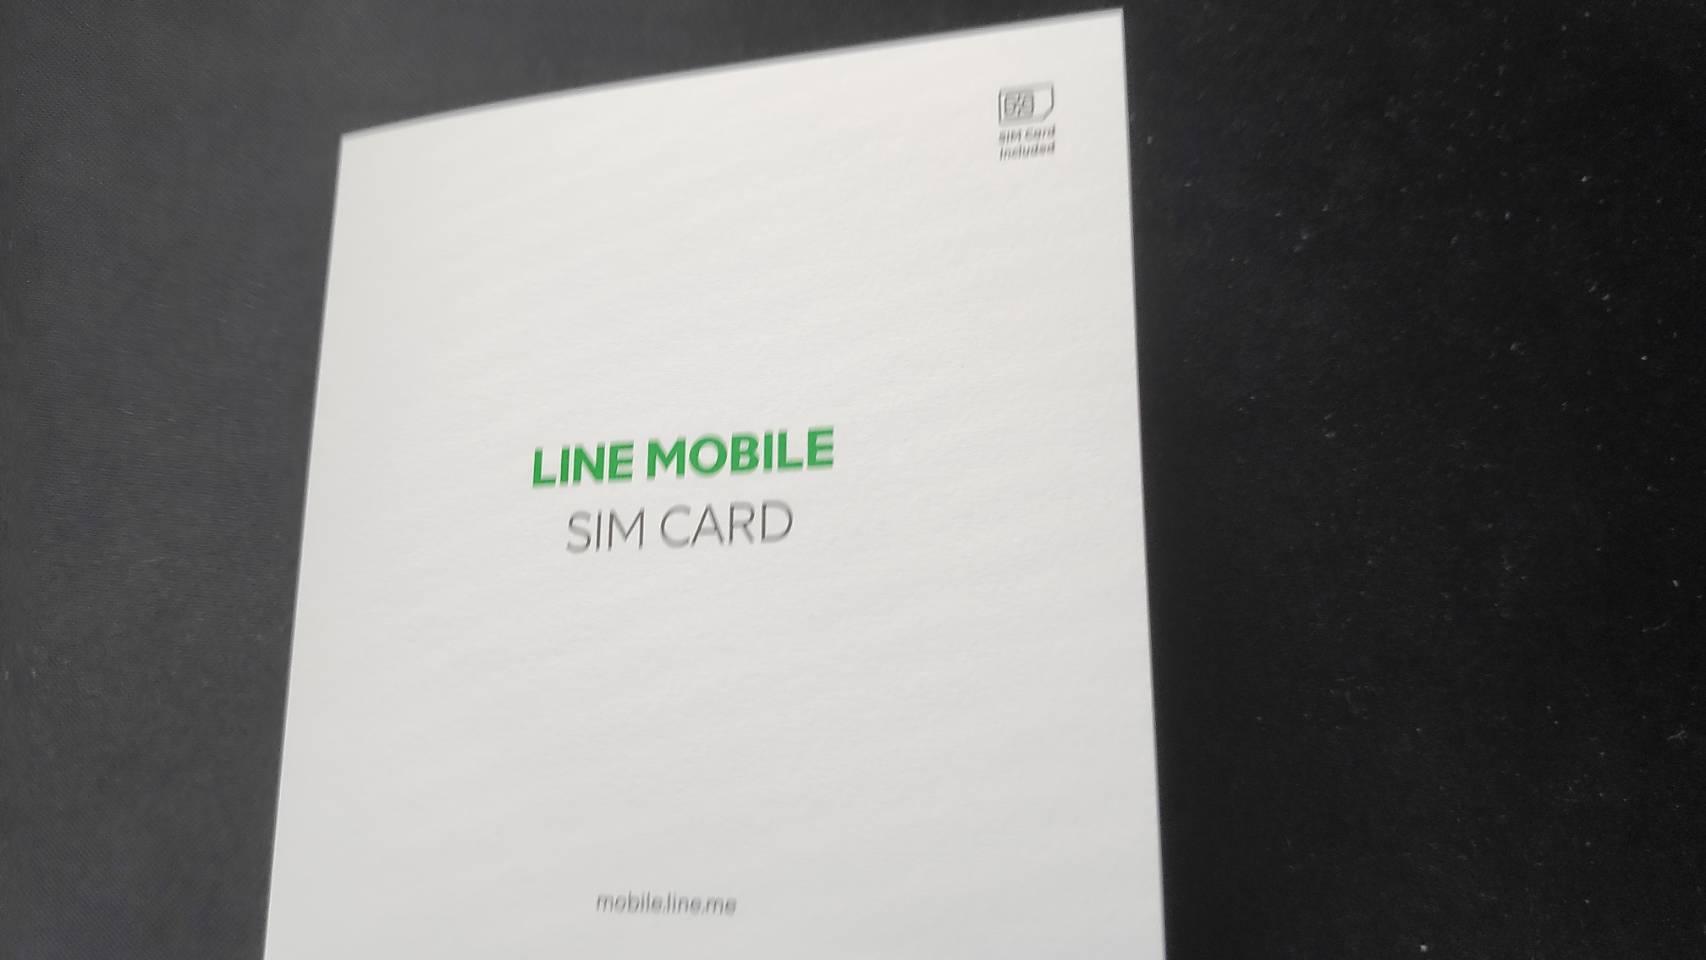 LINE MOBEILE SIM CARD